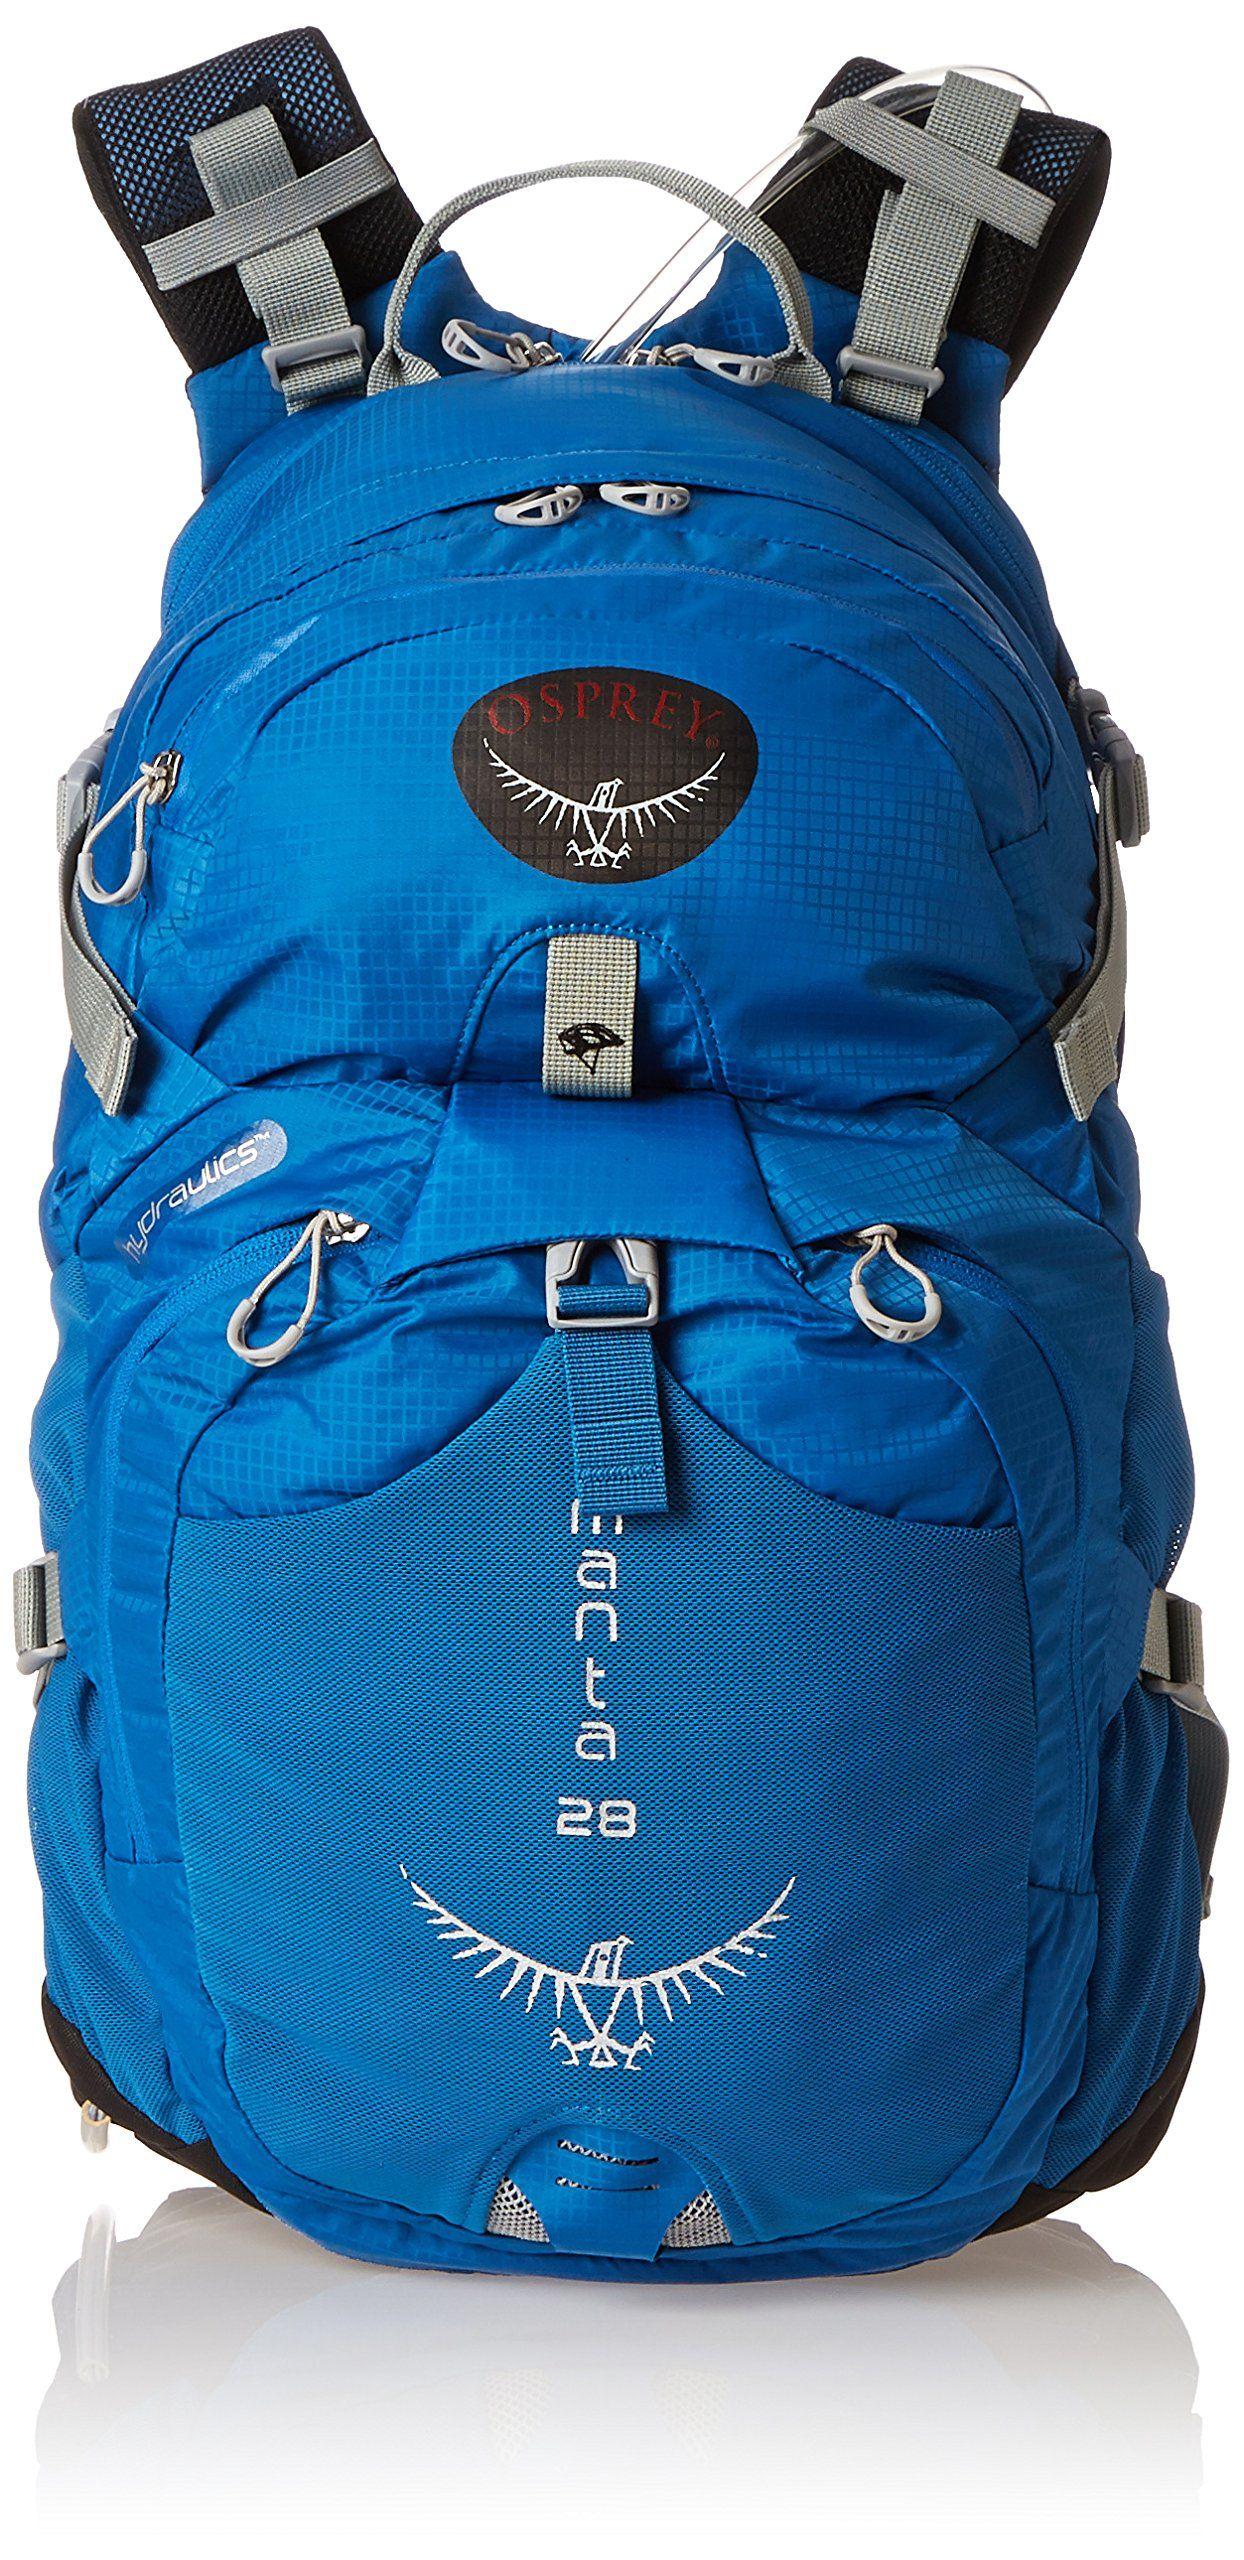 Osprey mens leather gloves - Amazon Com Osprey Men S Manta 28 Hydration Pack Hiking Hydration Packs Sports